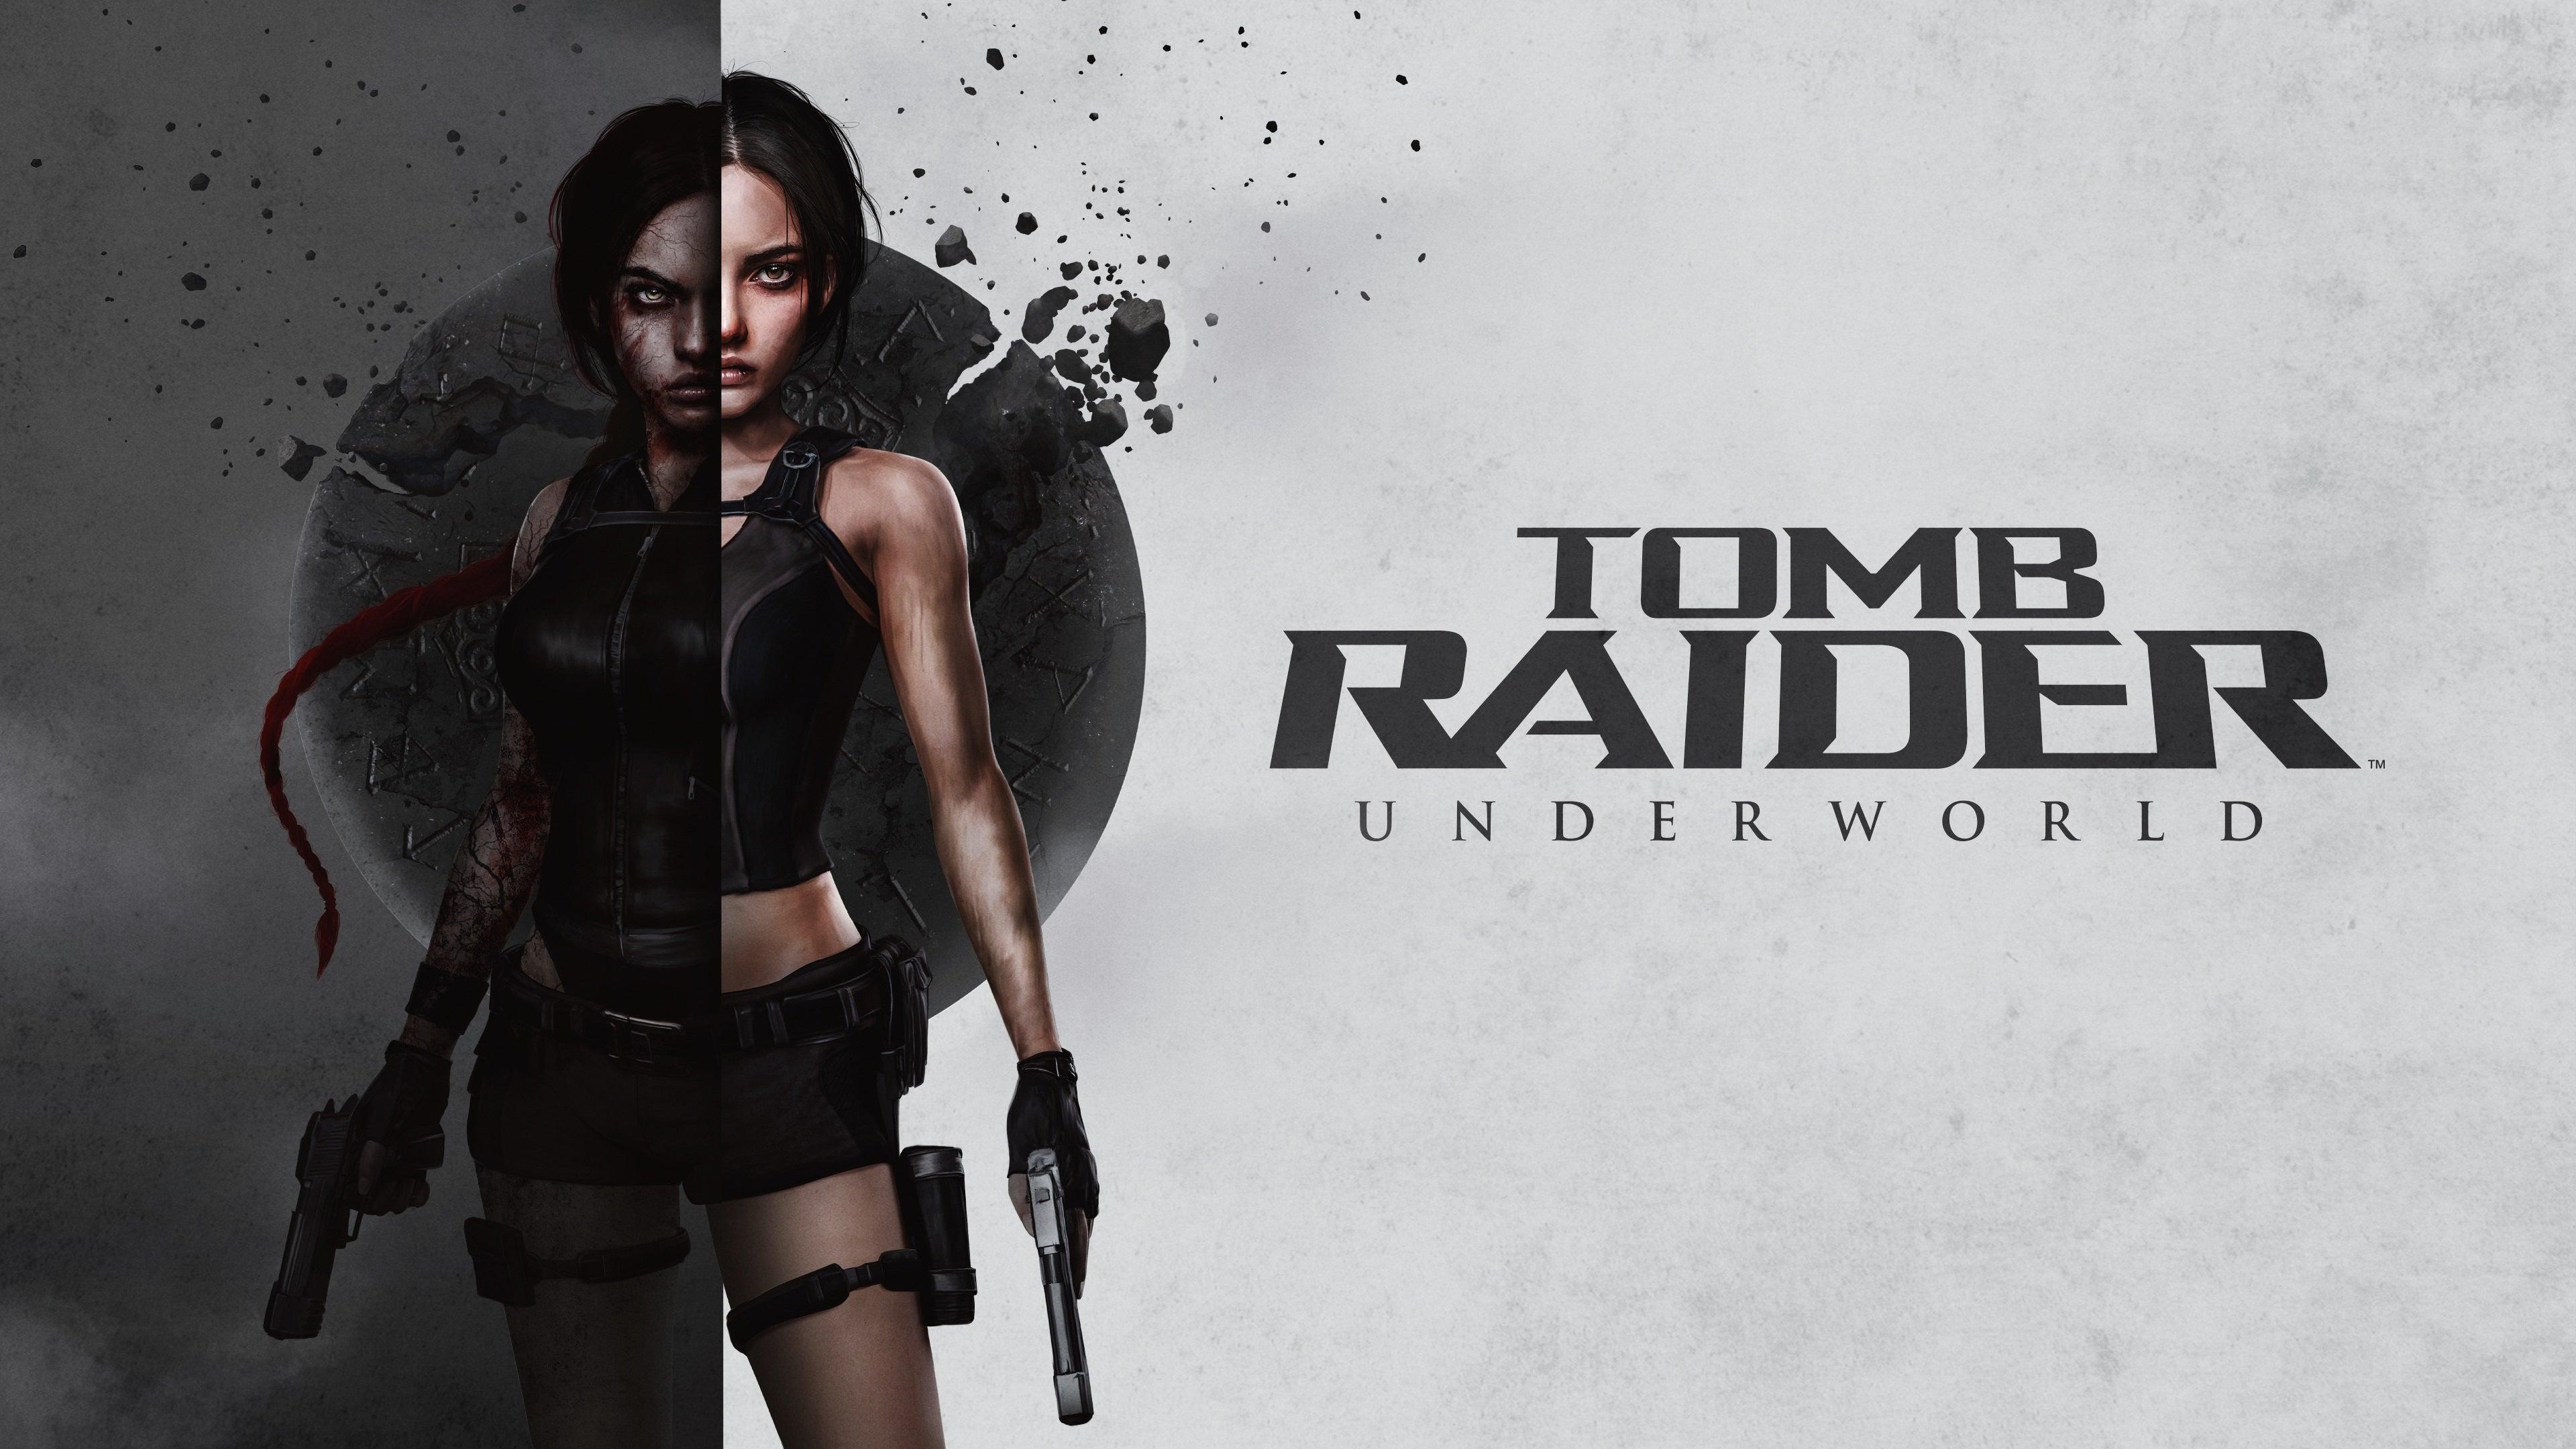 Full version of Laura H. Rubin's box art reimagining of Tomb Raider: Underworld